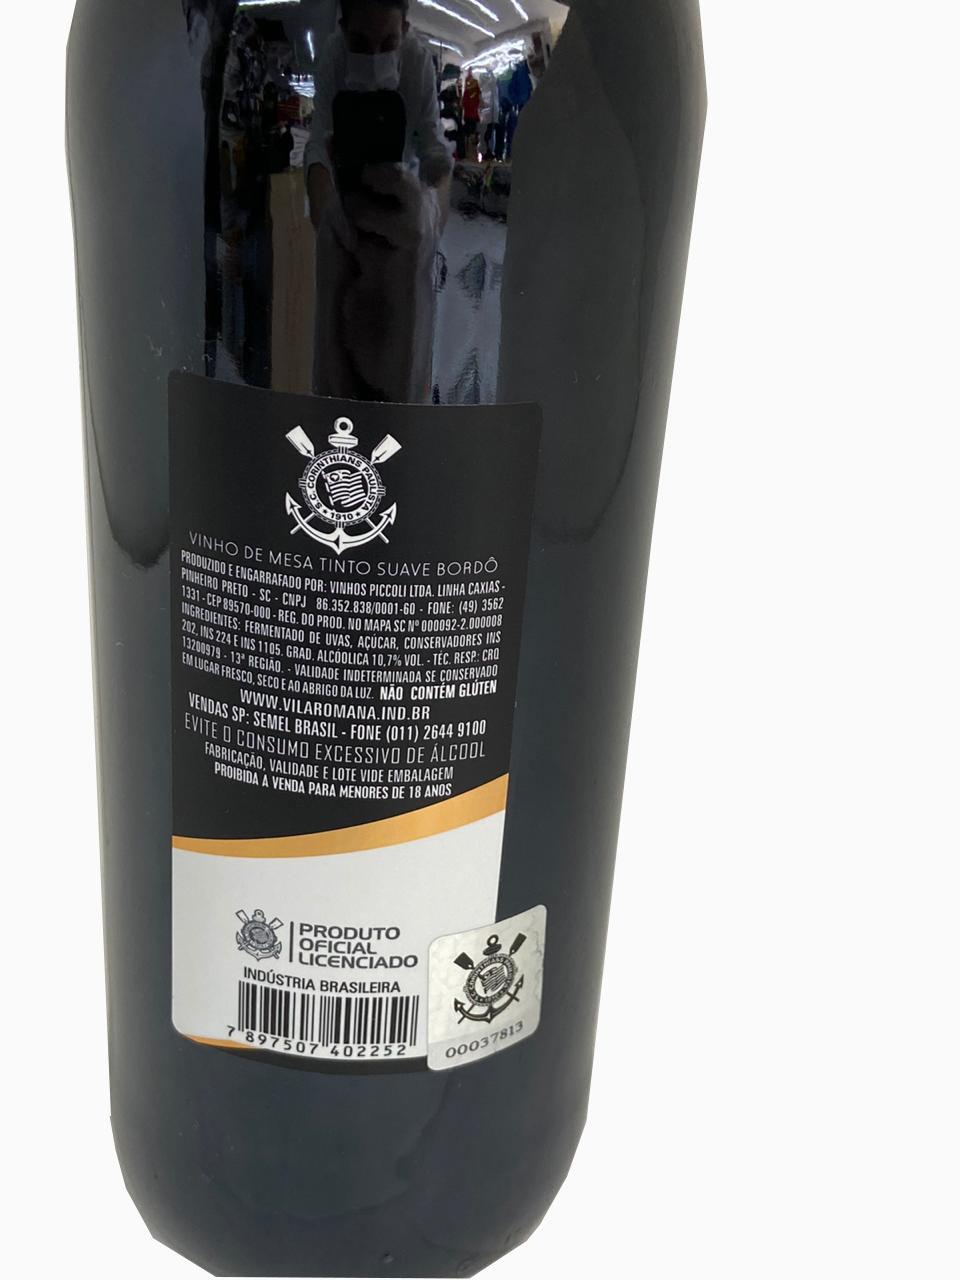 Vinho Corinthians tinto suave